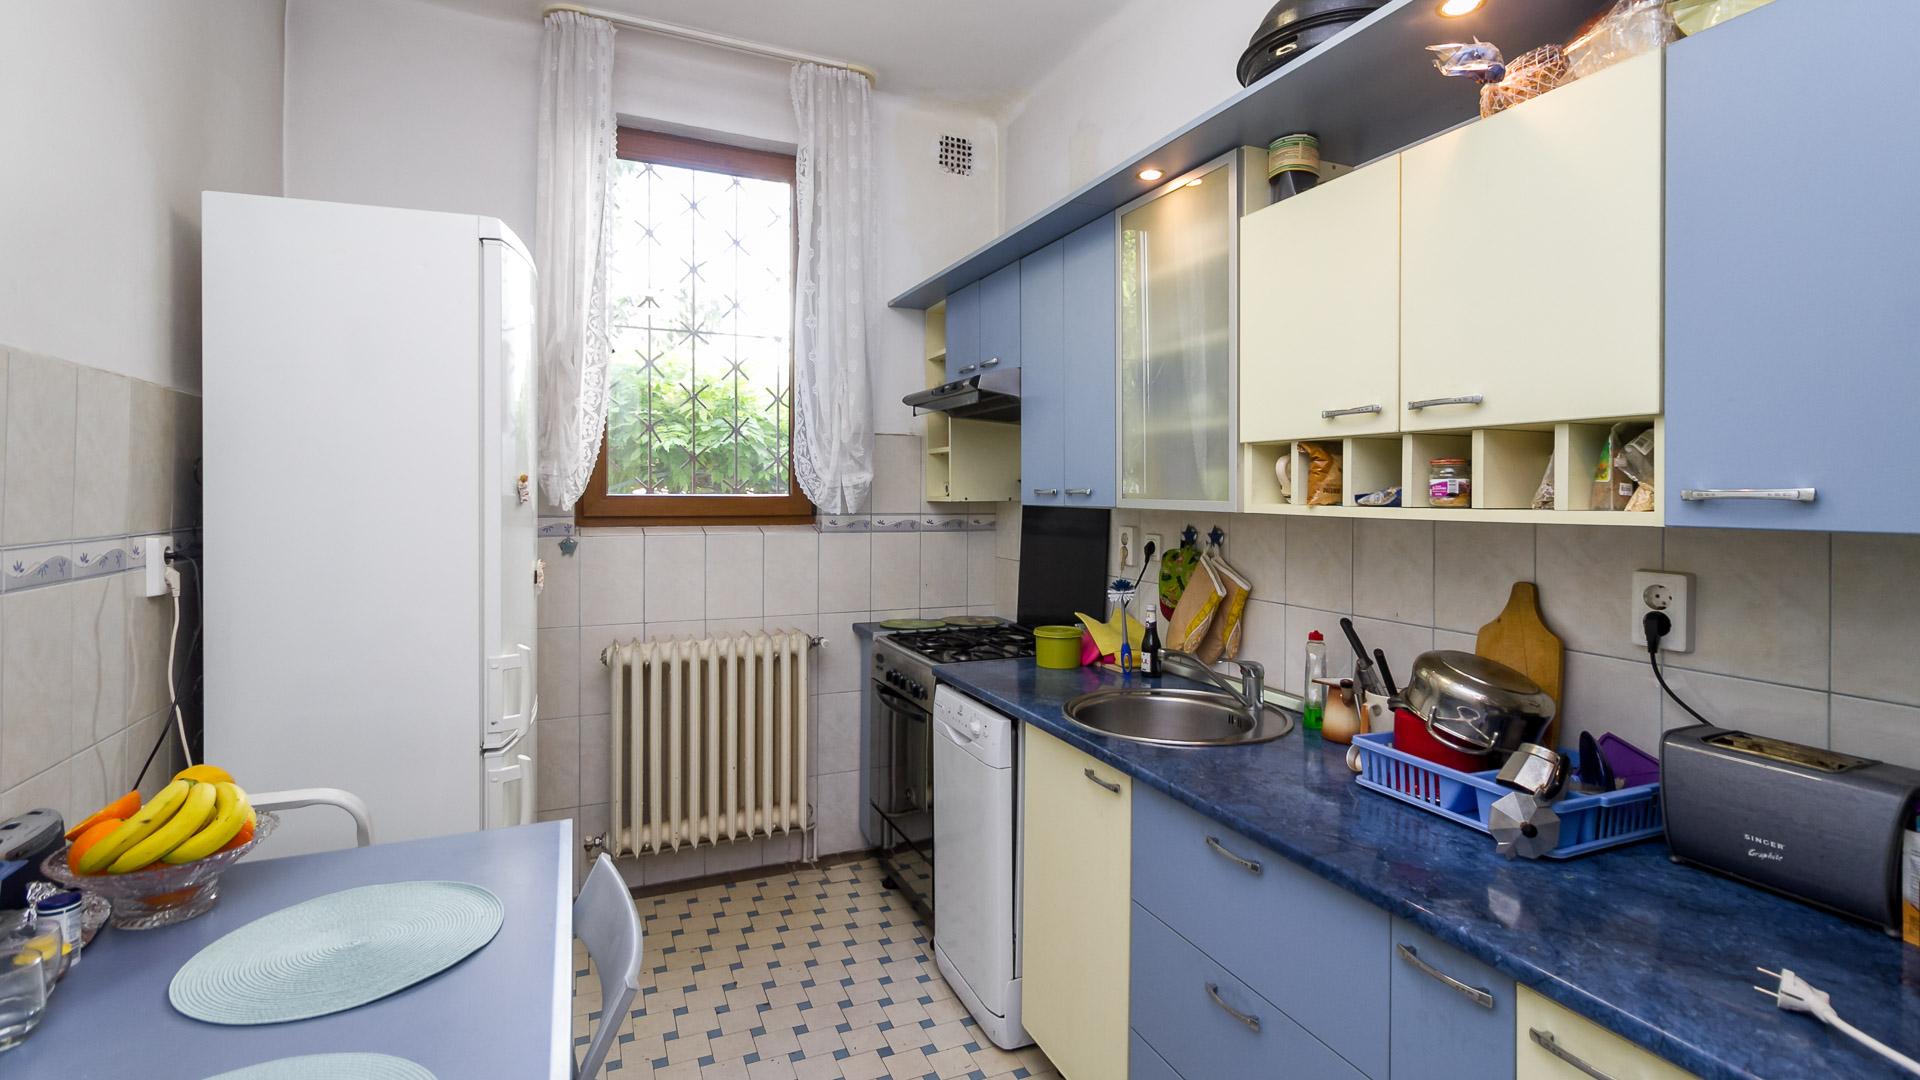 bucatarie-apartament-4-camere-parter-vila-metrou-parc-Tineretului